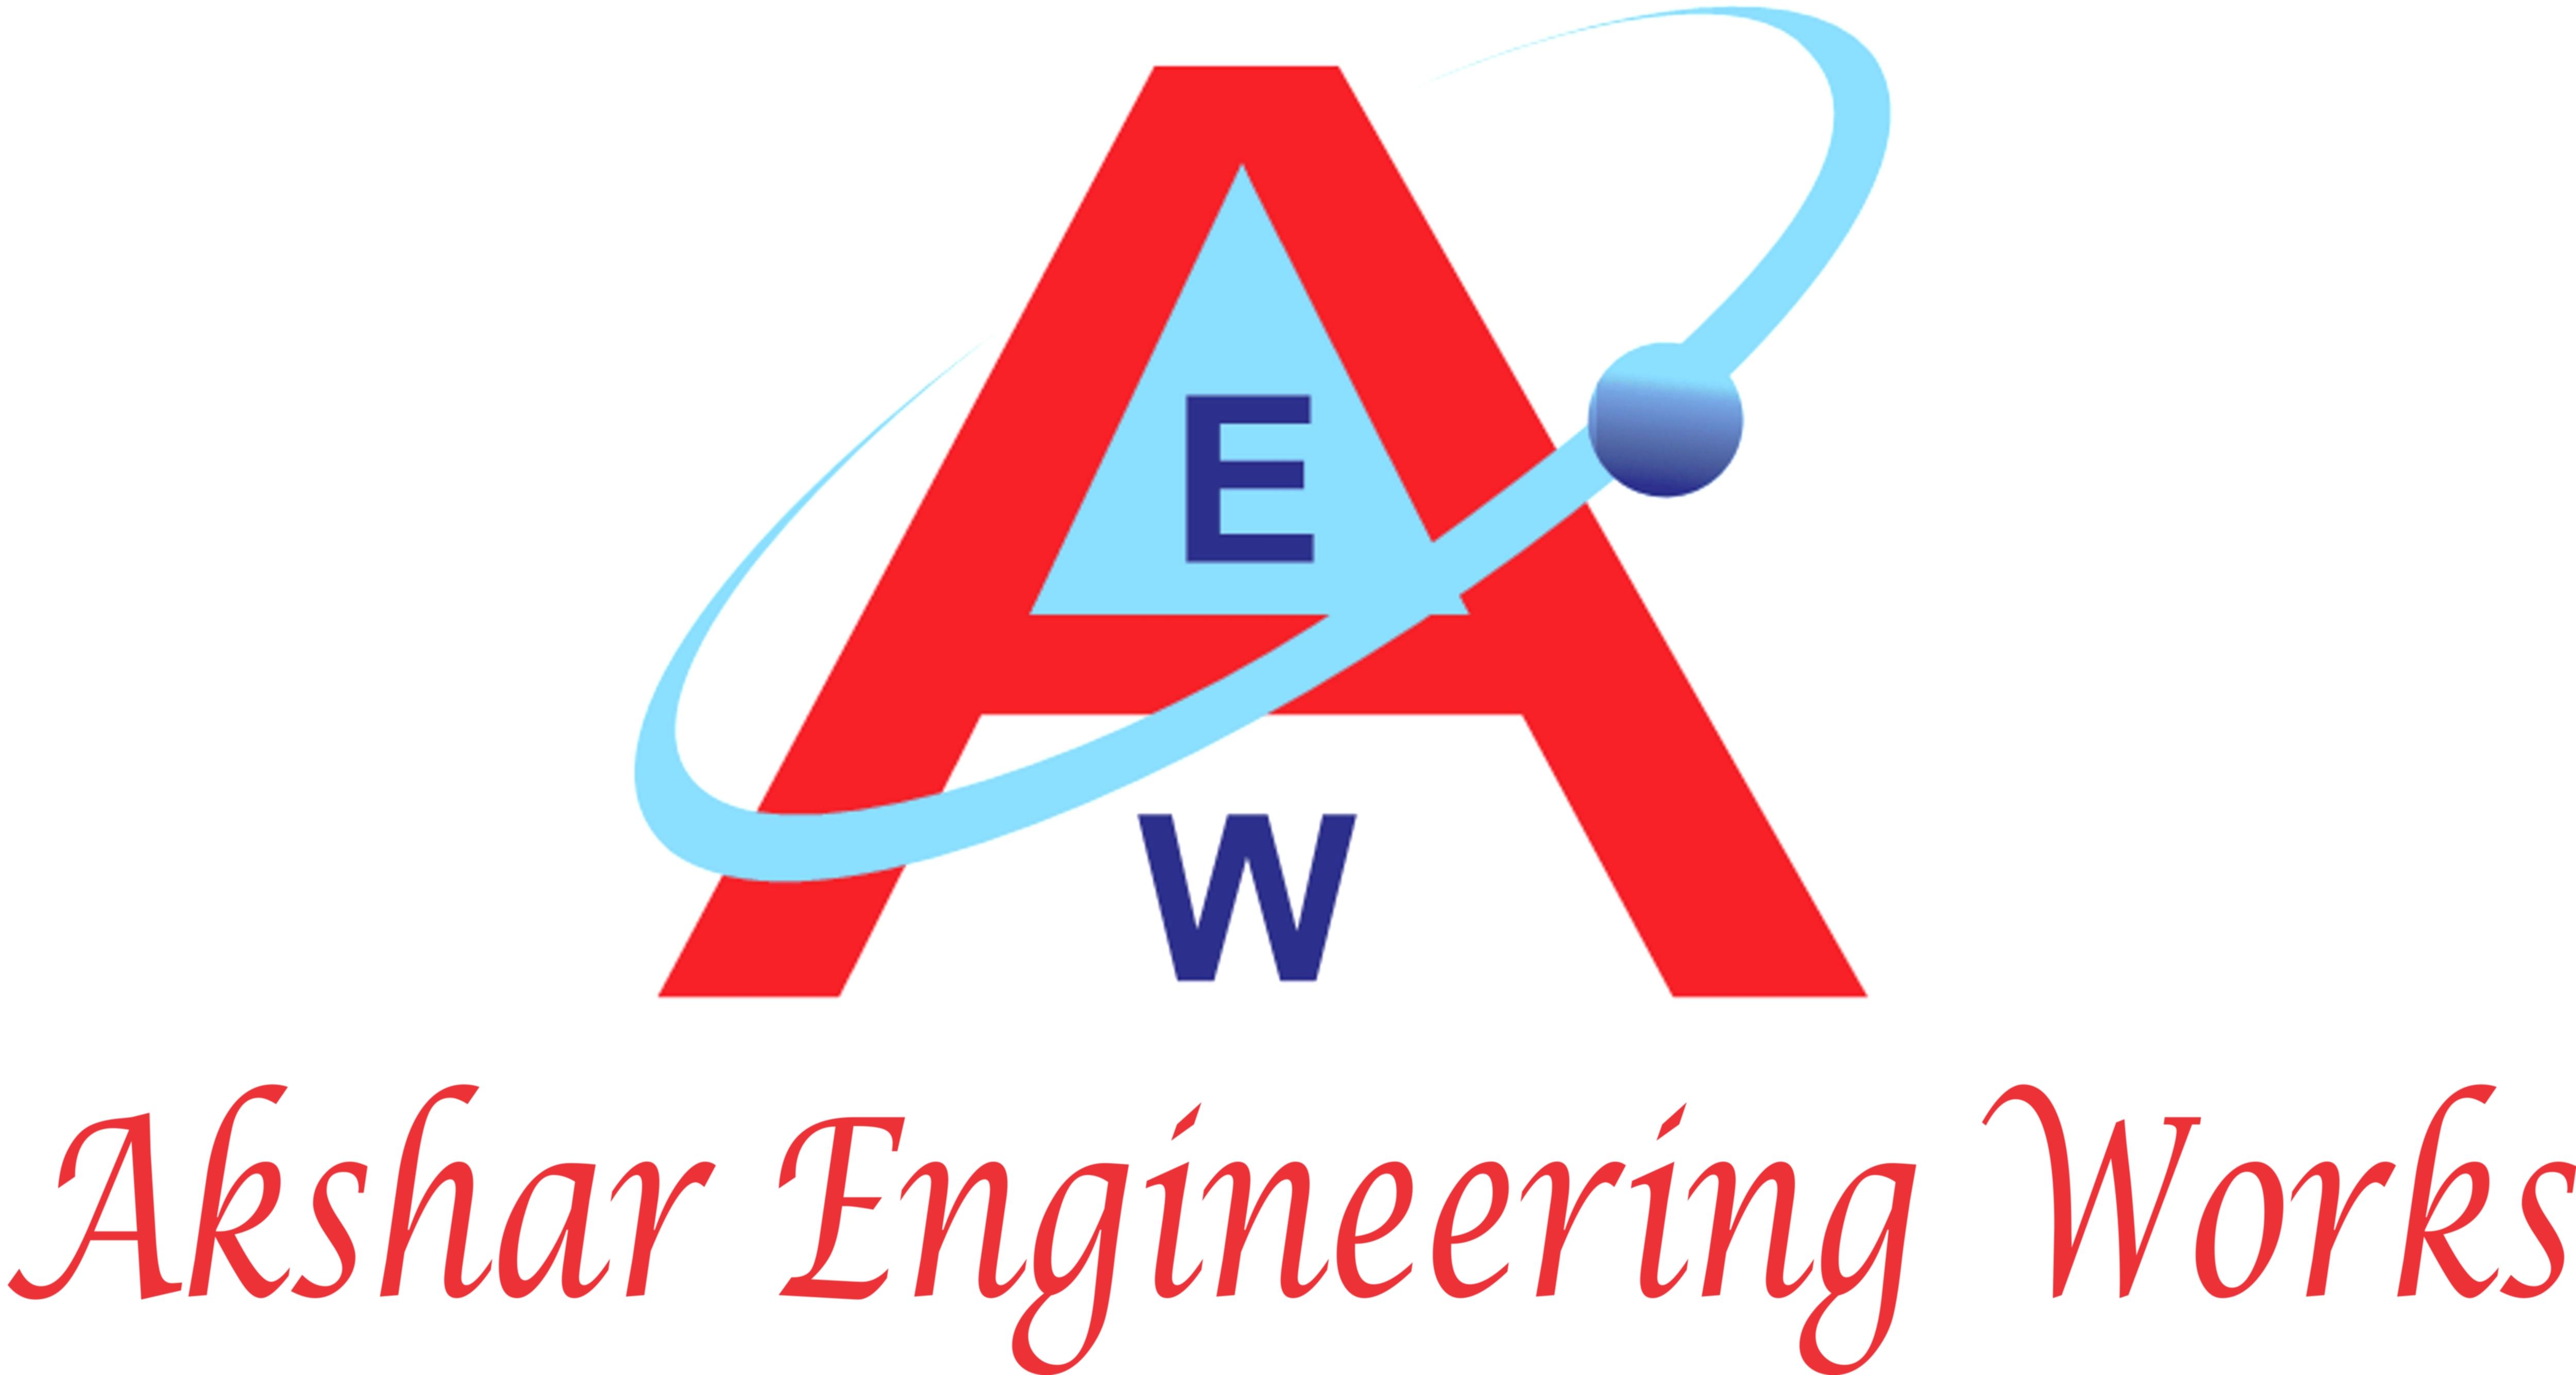 Akshar Engineering Works